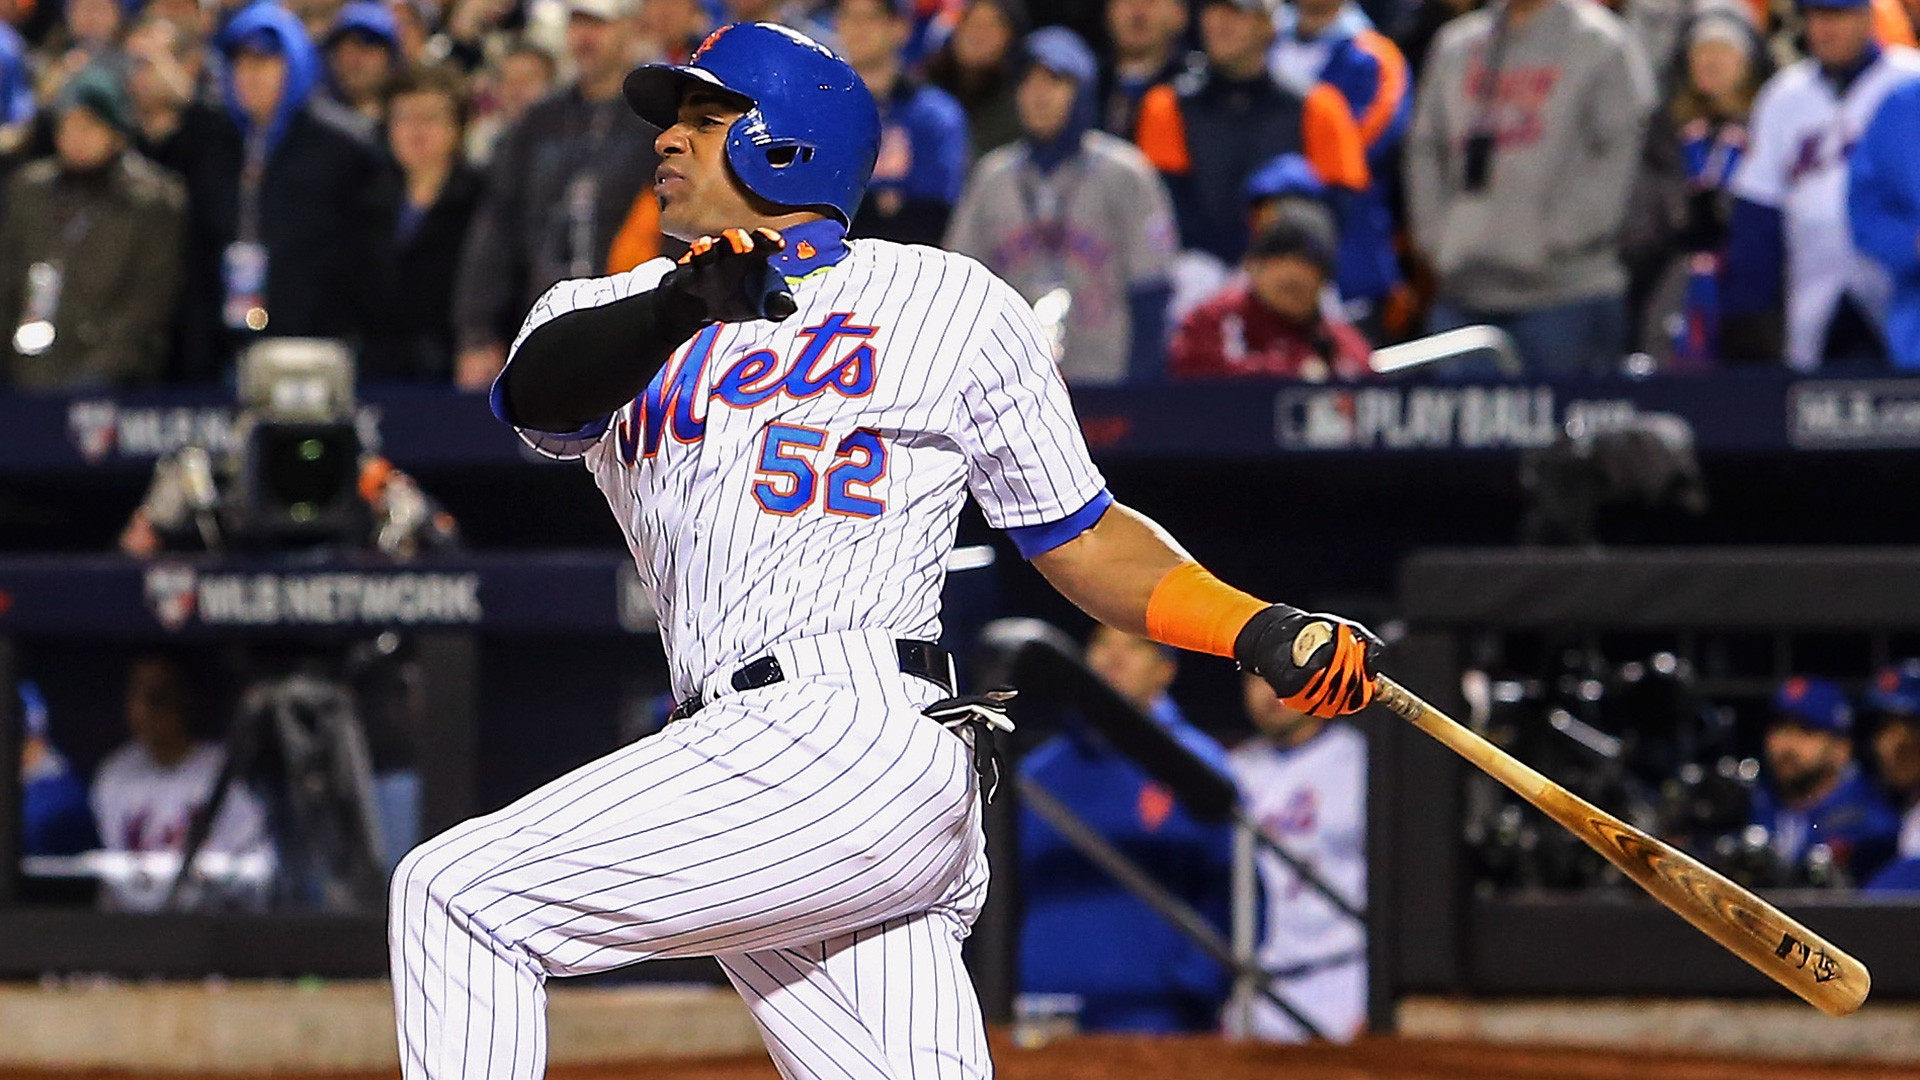 Cespedes' return sets up Mets for National League title defense   MLB    Sporting News